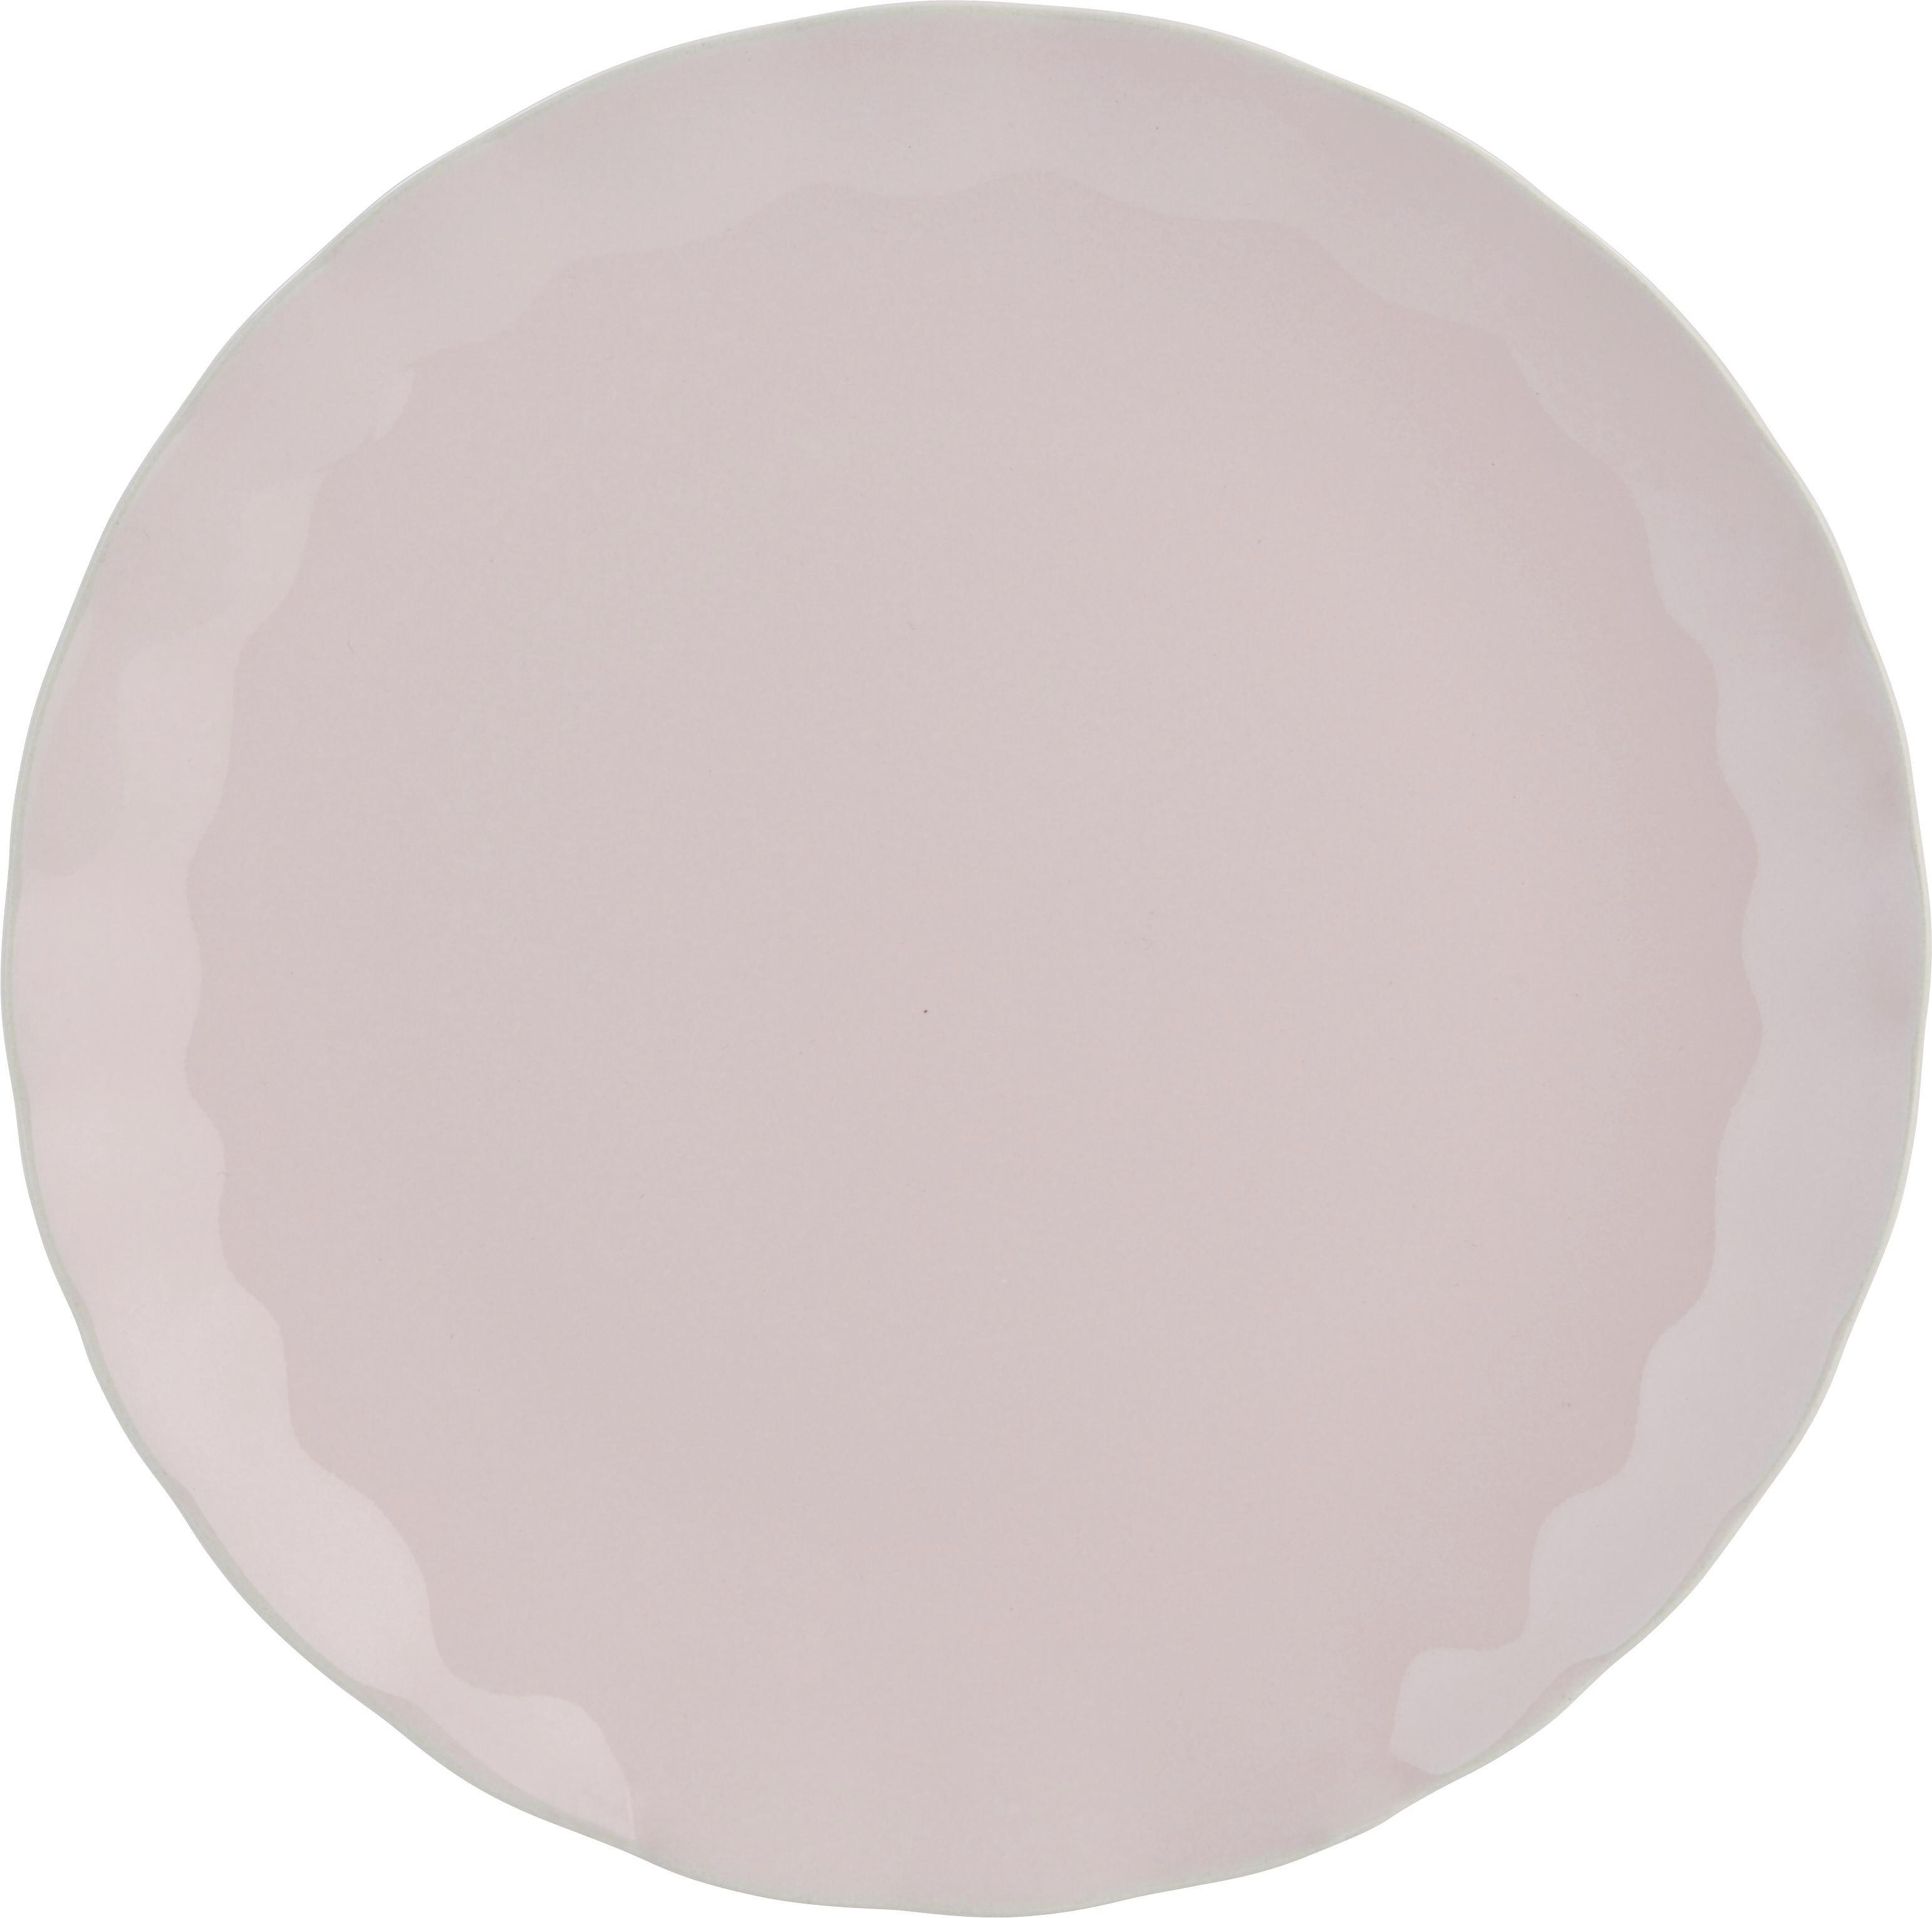 Plitvi Krožnik Pauline - roza, Romantika, keramika (26cm) - ZANDIARA